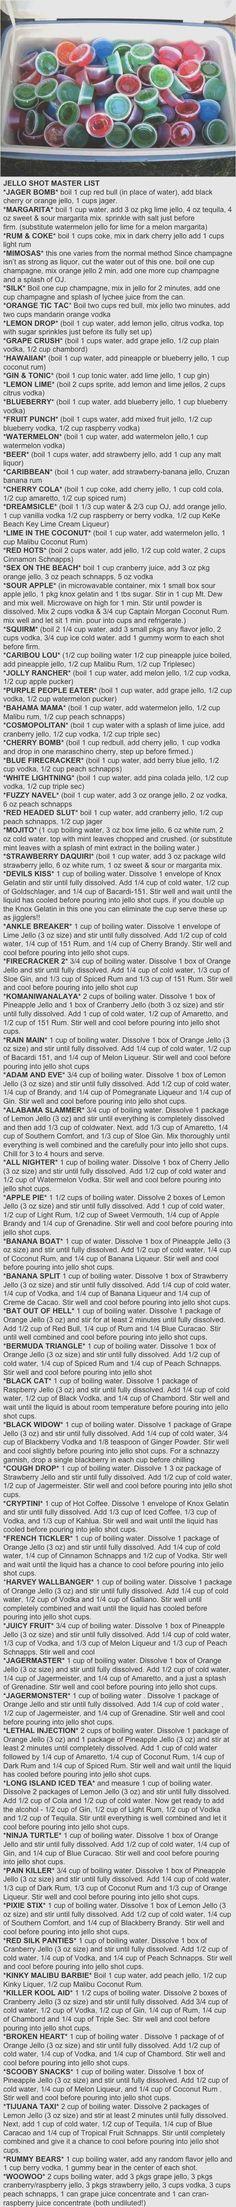 Santa Hat Jello Shots Fun - Elegant Santa Hat Jello Shots Fun, Minion Jello Shots Blueberry and Lemon